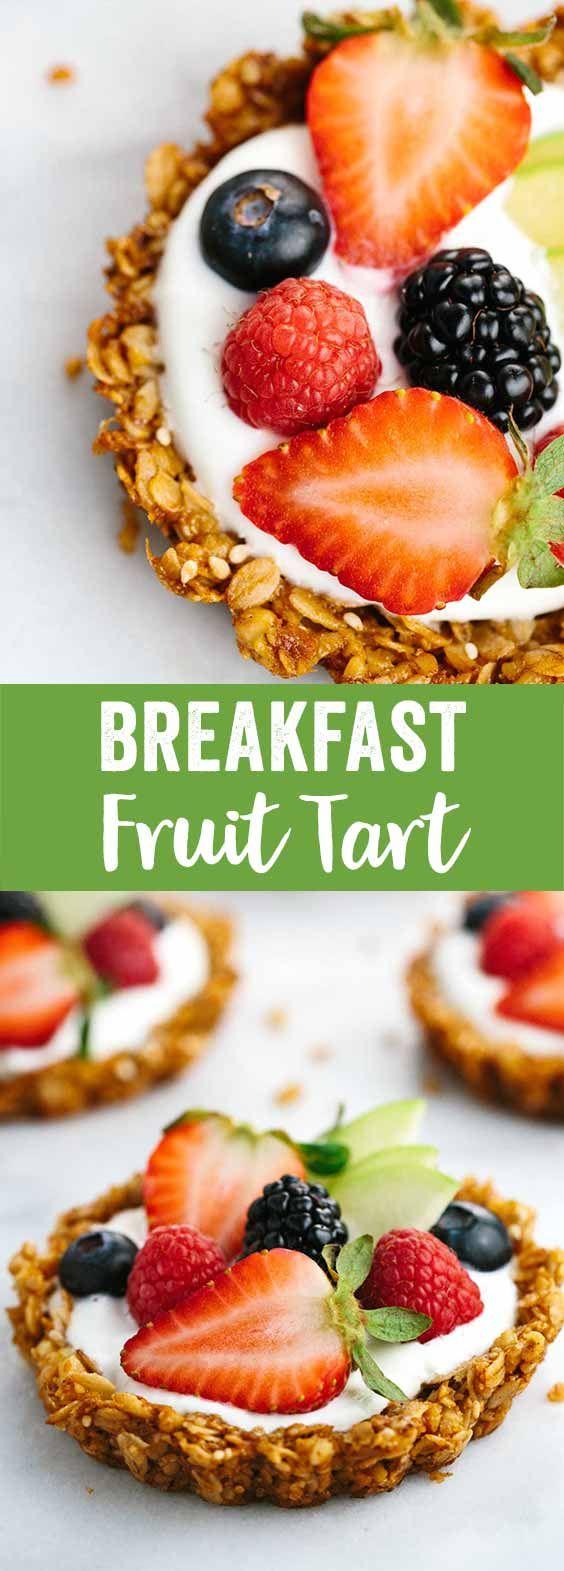 Breakfast Fruit Tart With Granola Crust Jessica Gavin Recipe Yogurt Recipes Fruit Tart Fruit Breakfast